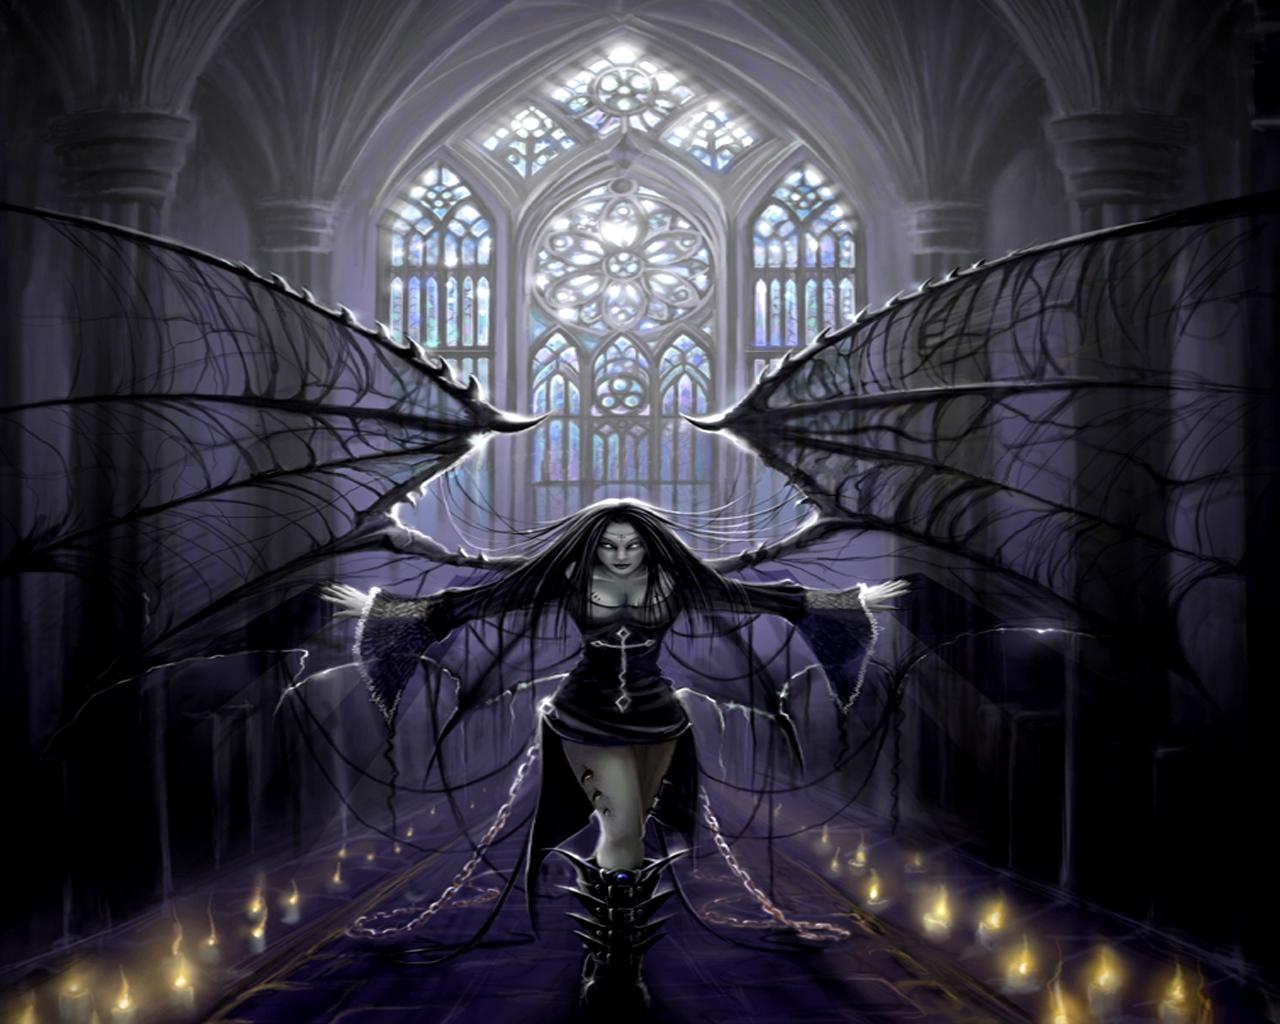 Angels wallpapers - Dark gothic angel wallpaper ...